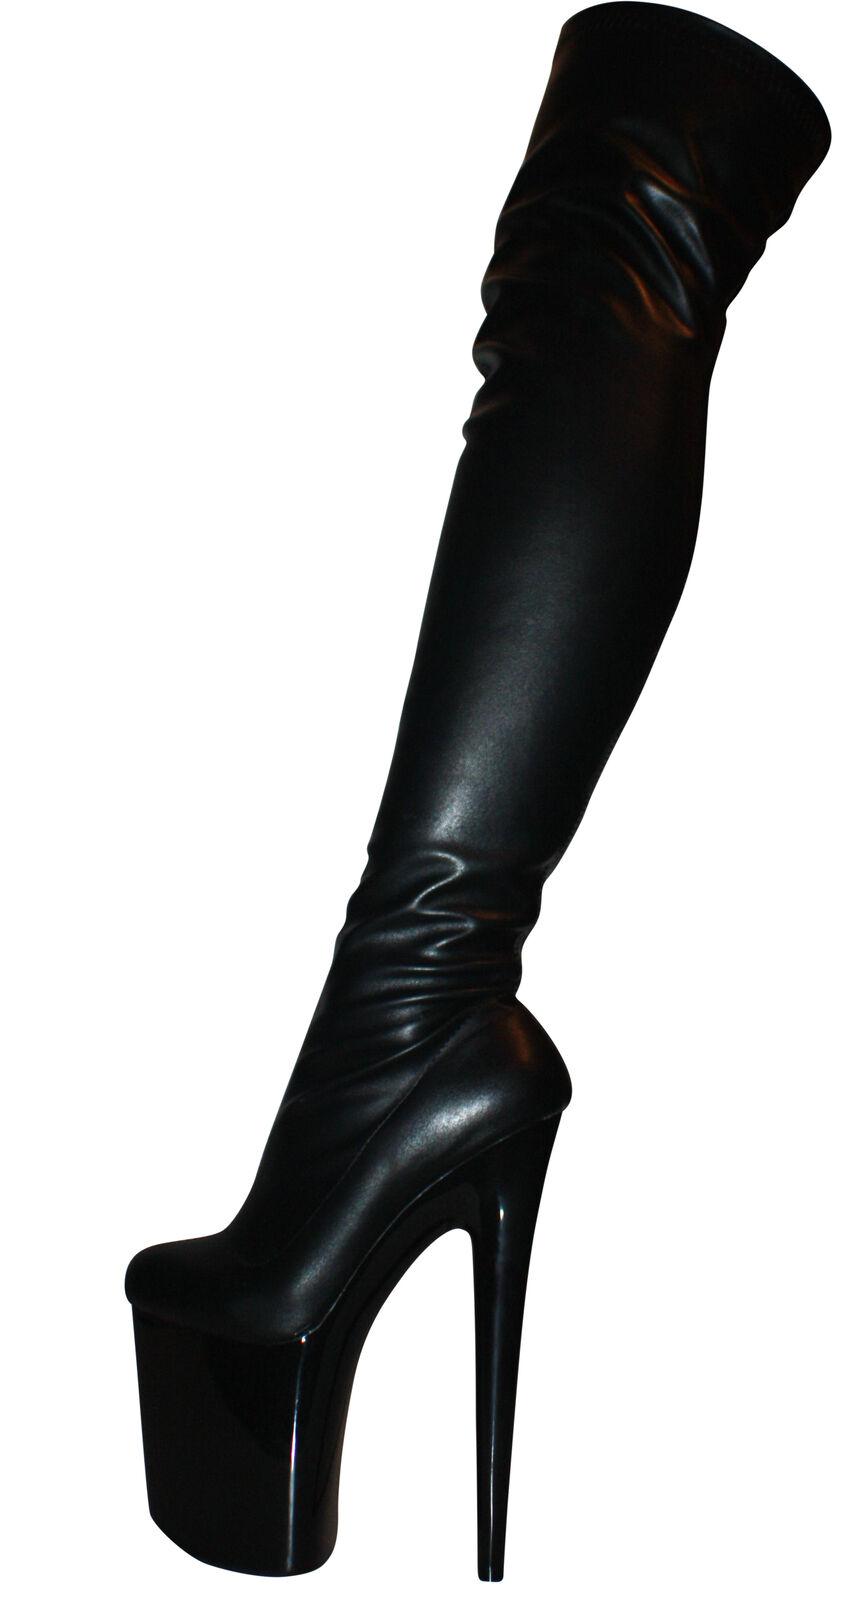 Erogance sexy altas plataforma tacón alto altas sexy botas talla 37-43 nuevo 4986 negro mate 748be0